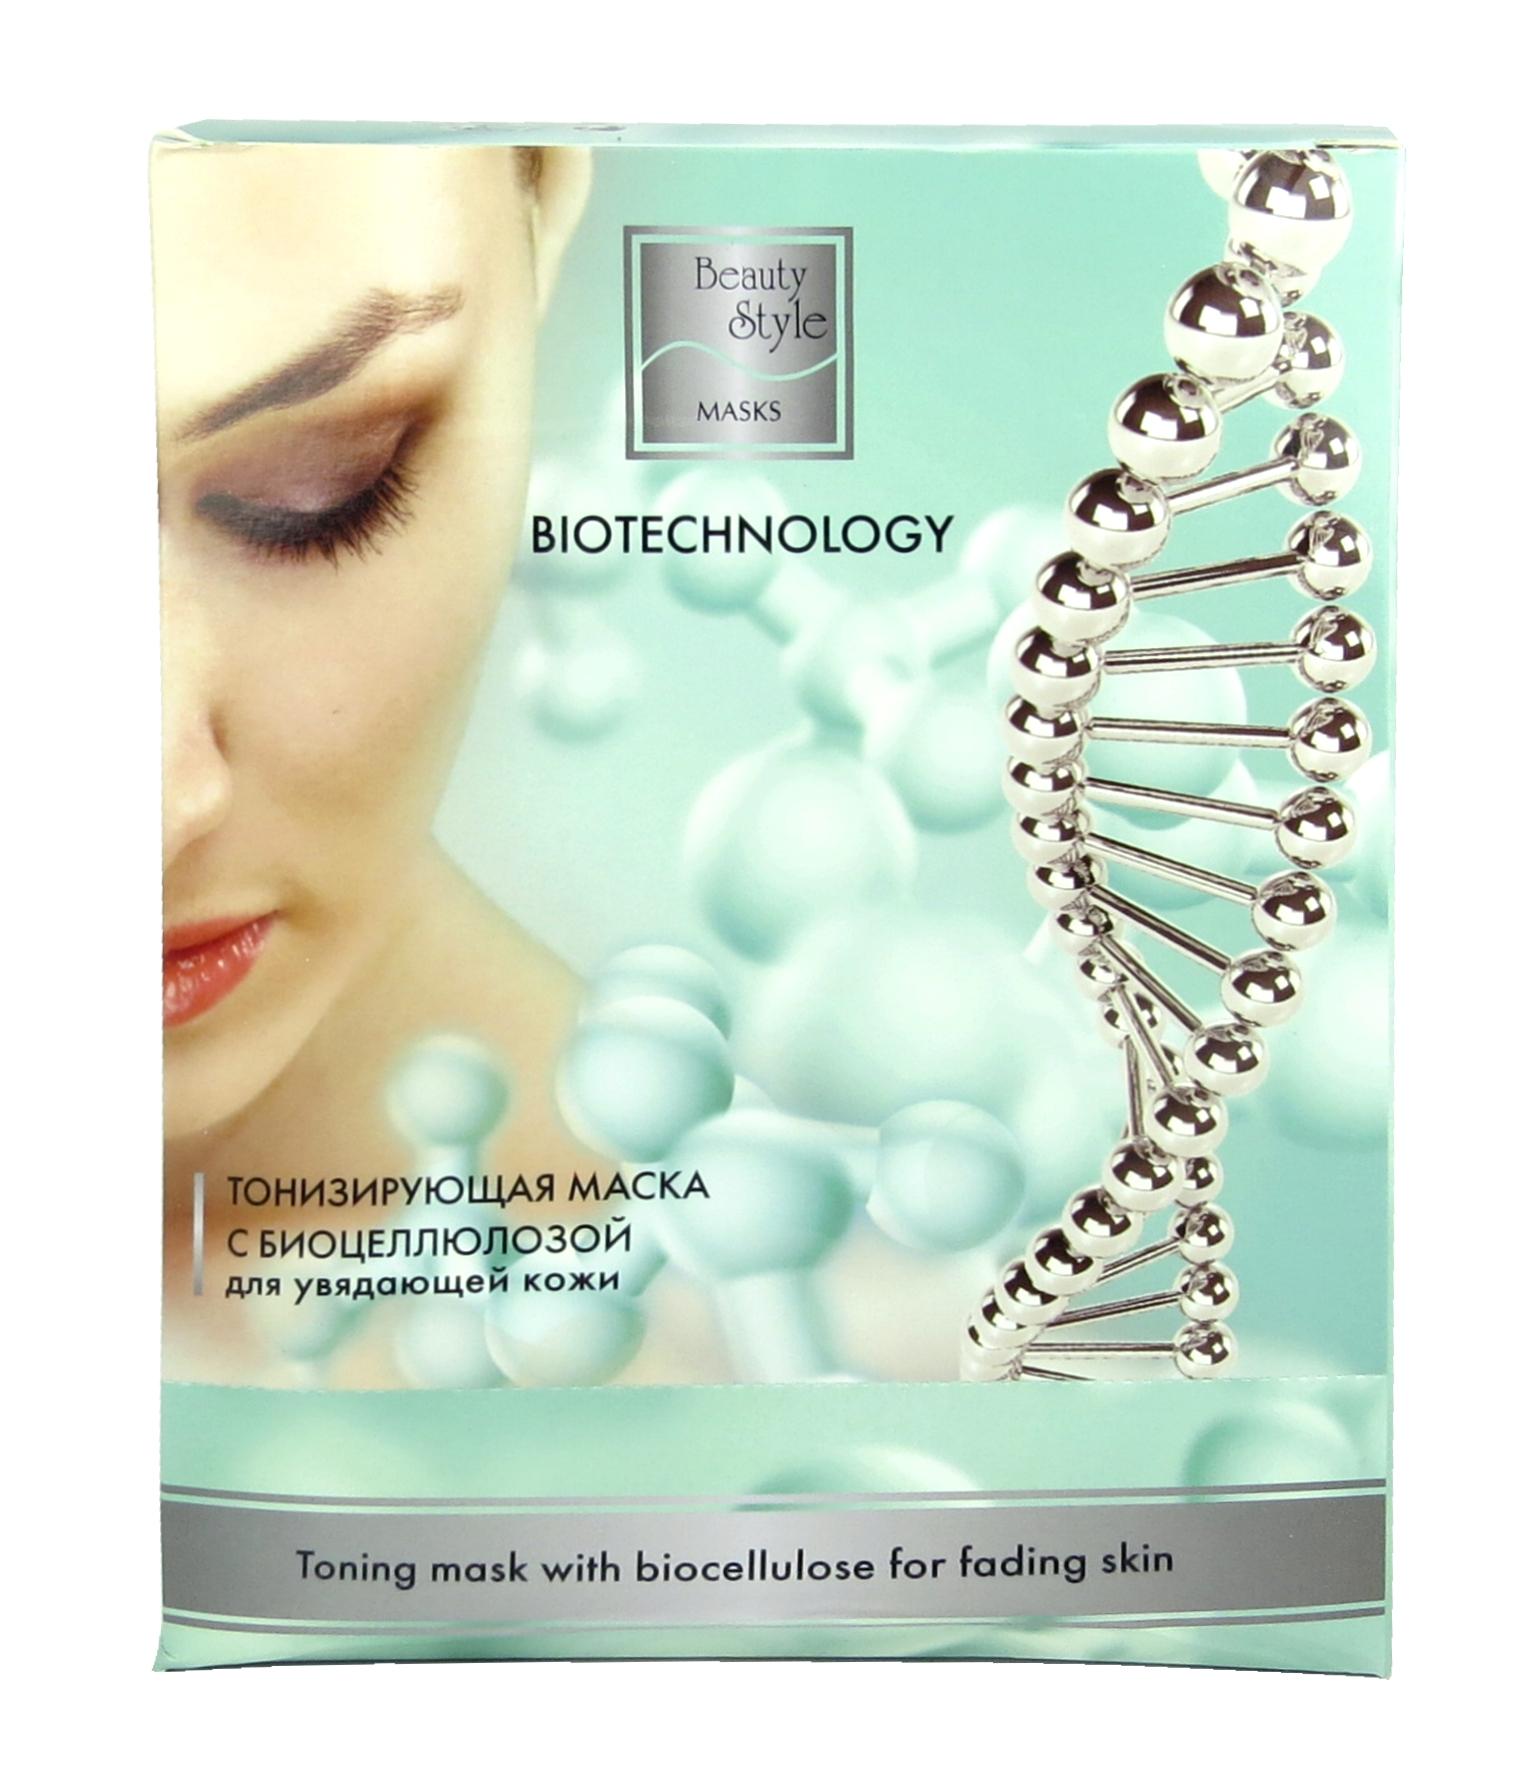 BEAUTY STYLE Маска тонизирующая с биоцеллюлозой для увядающей кожи